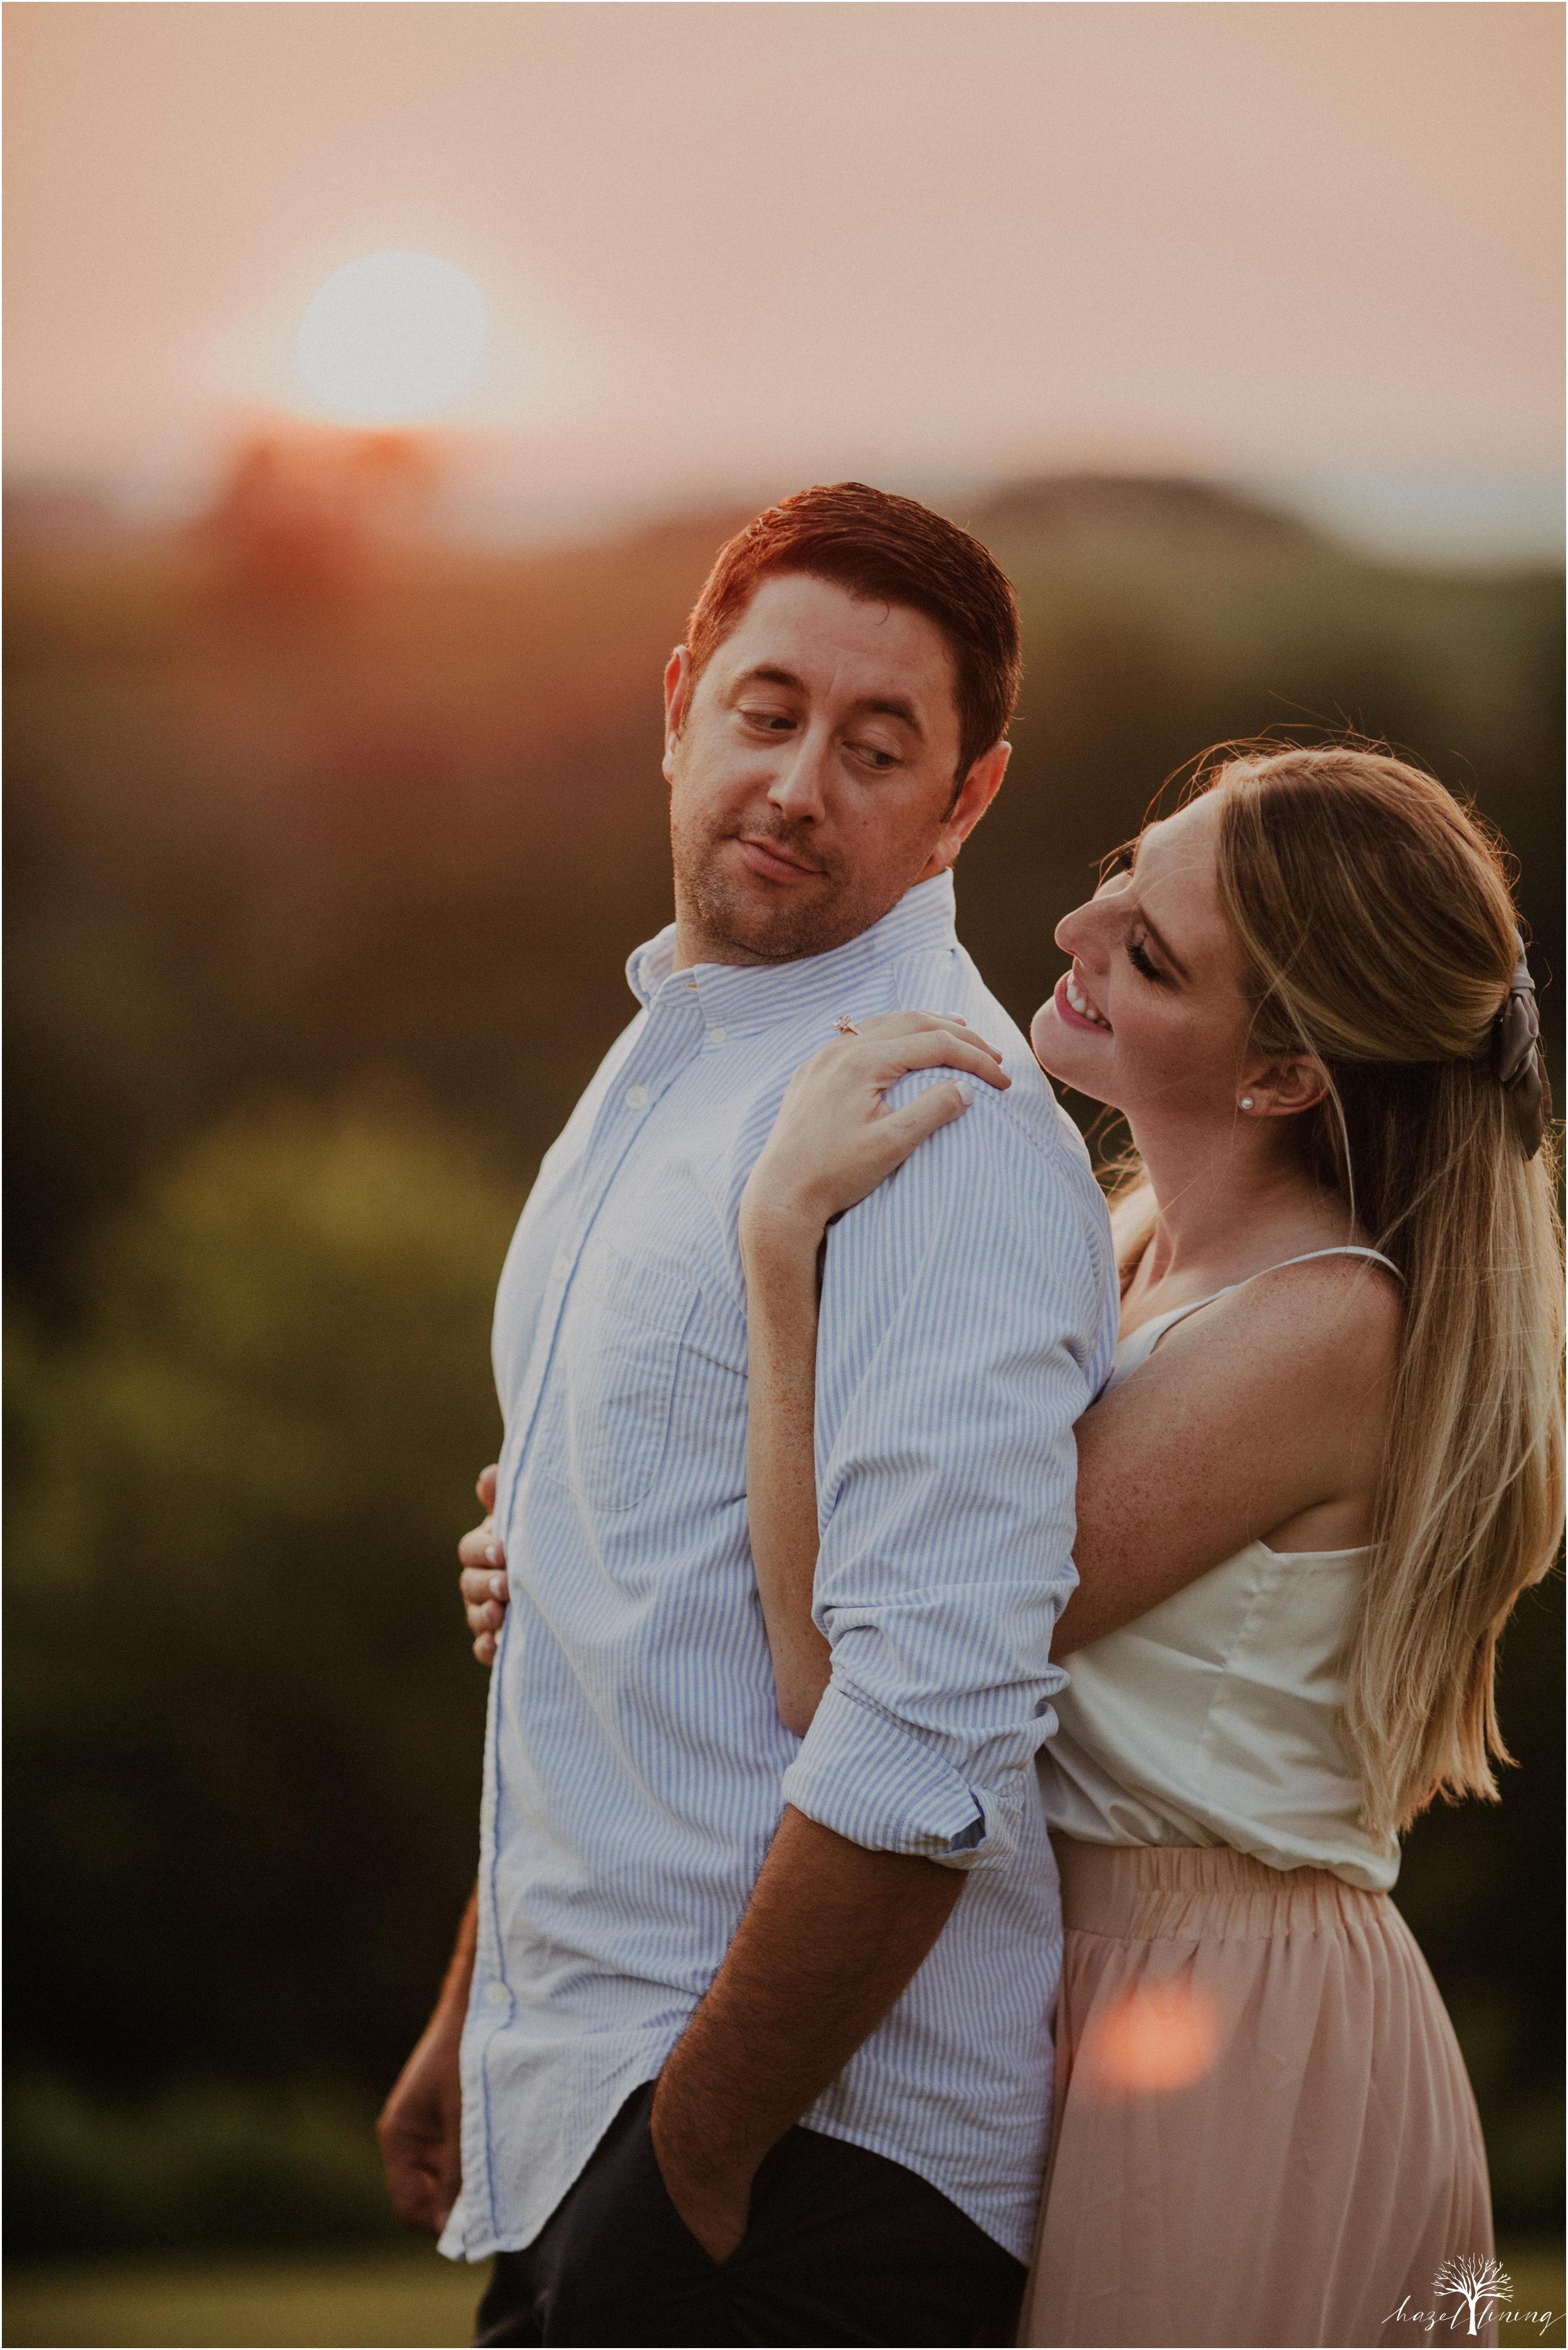 ashley-fillmore-steve-reimer-trexler-nature-preserve-summer-engagement-session-schnecksville-pennsylvania-hazel-lining-photography-destination-elopement-wedding-engagement-photography_0052.jpg